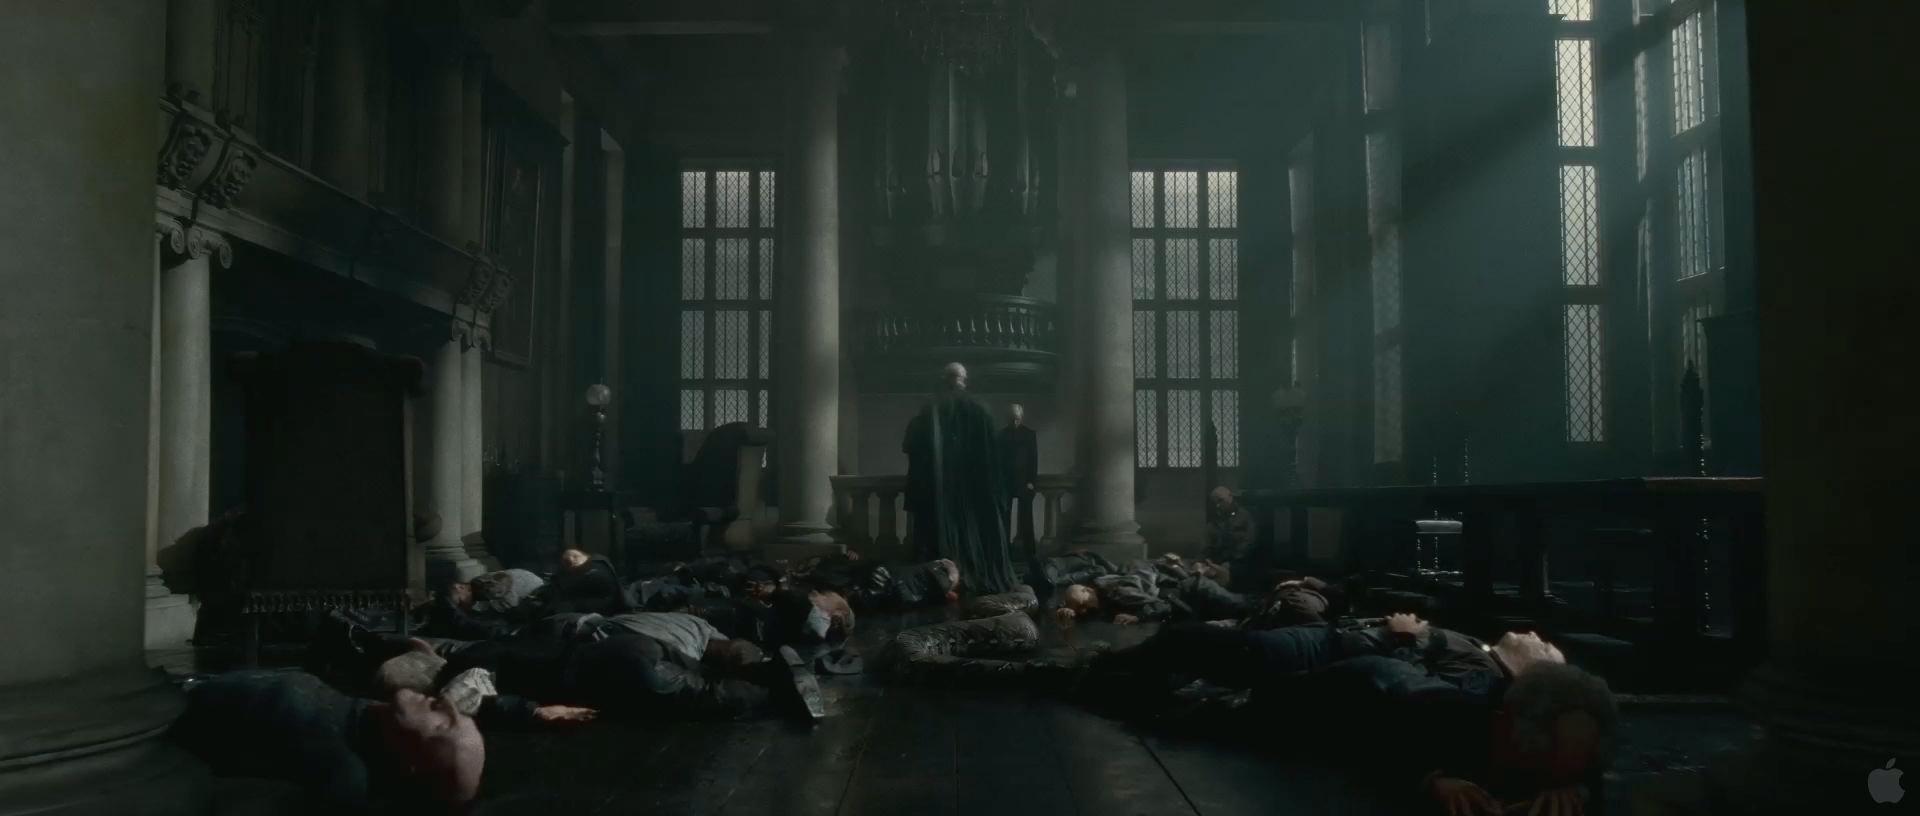 Harry Potter BlogHogwarts HP7 2 Trailer 16